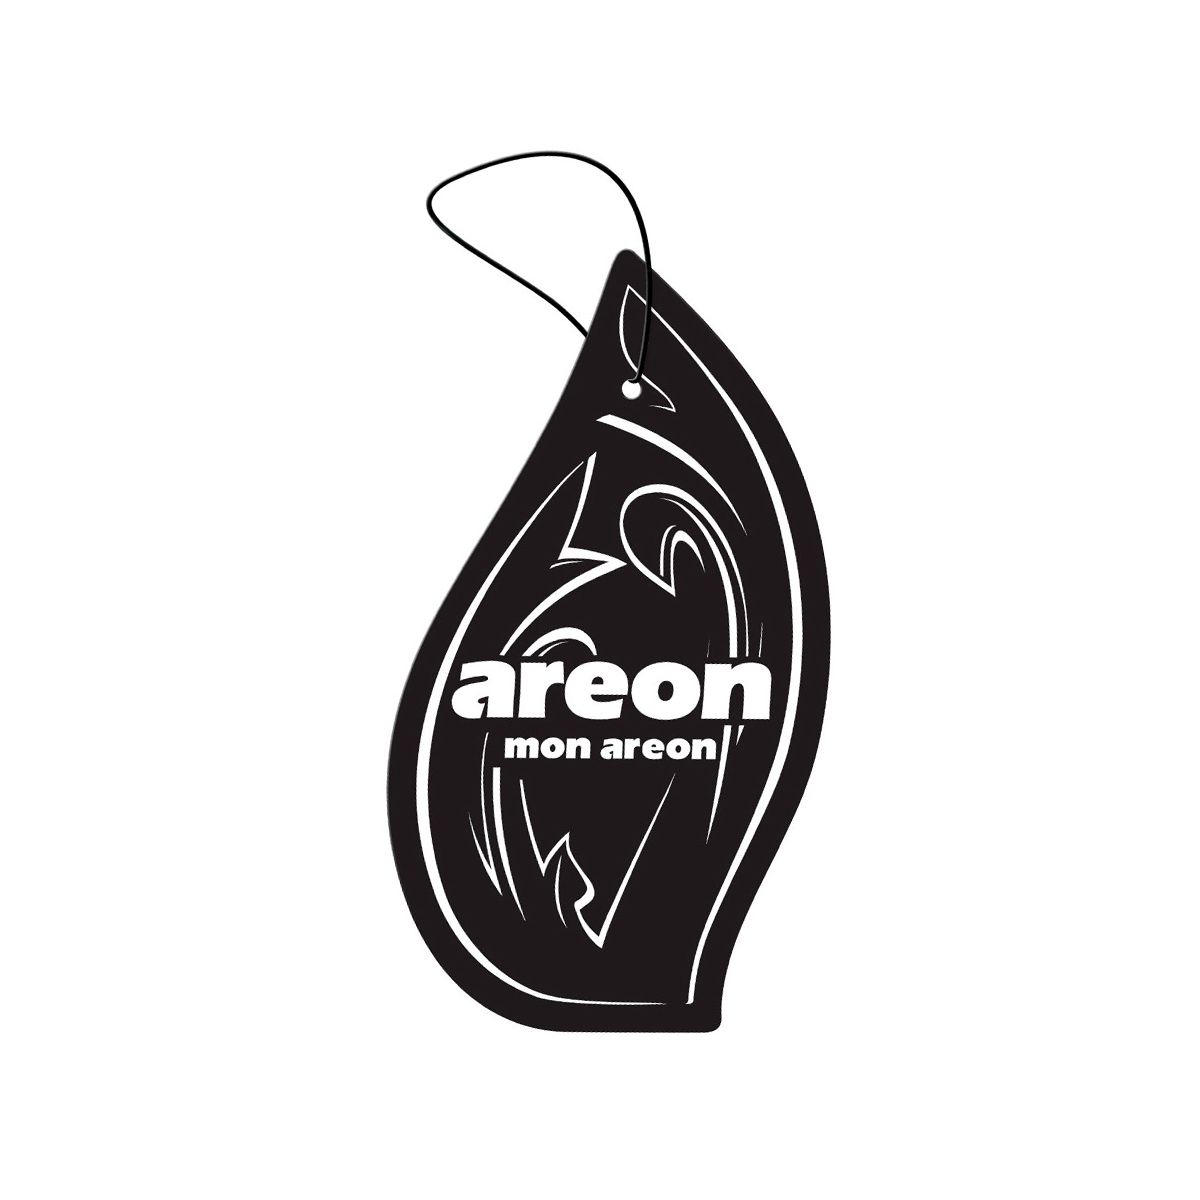 Aromatizante Mon Areon - Black Crystal